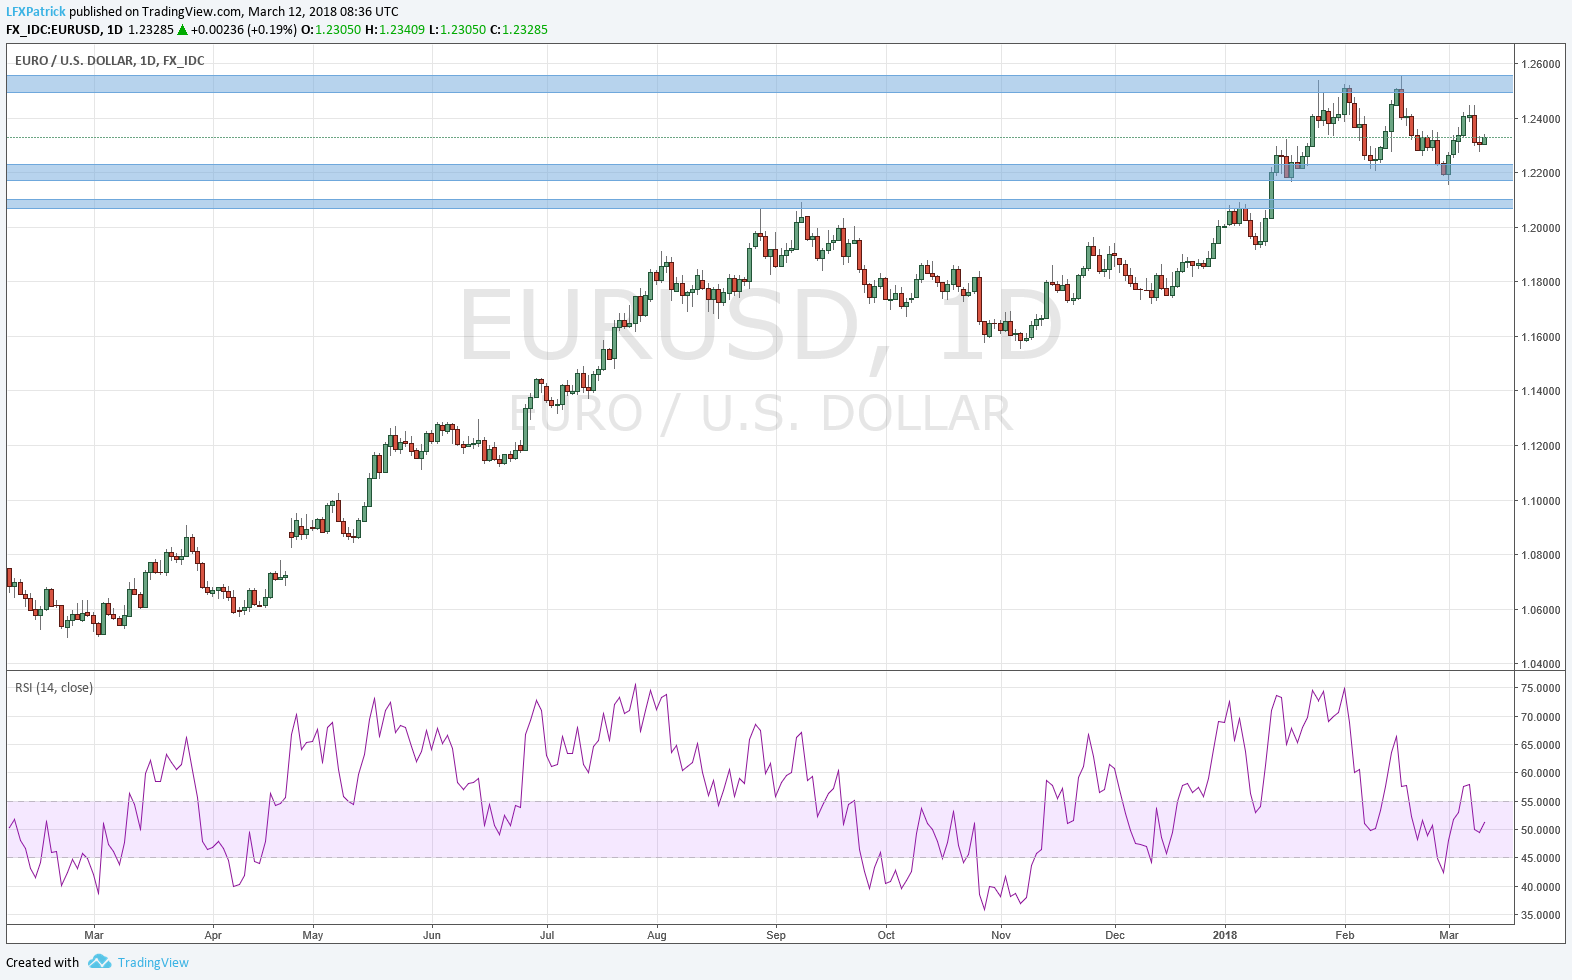 Euro/US Dollar 1 Day FX IDC